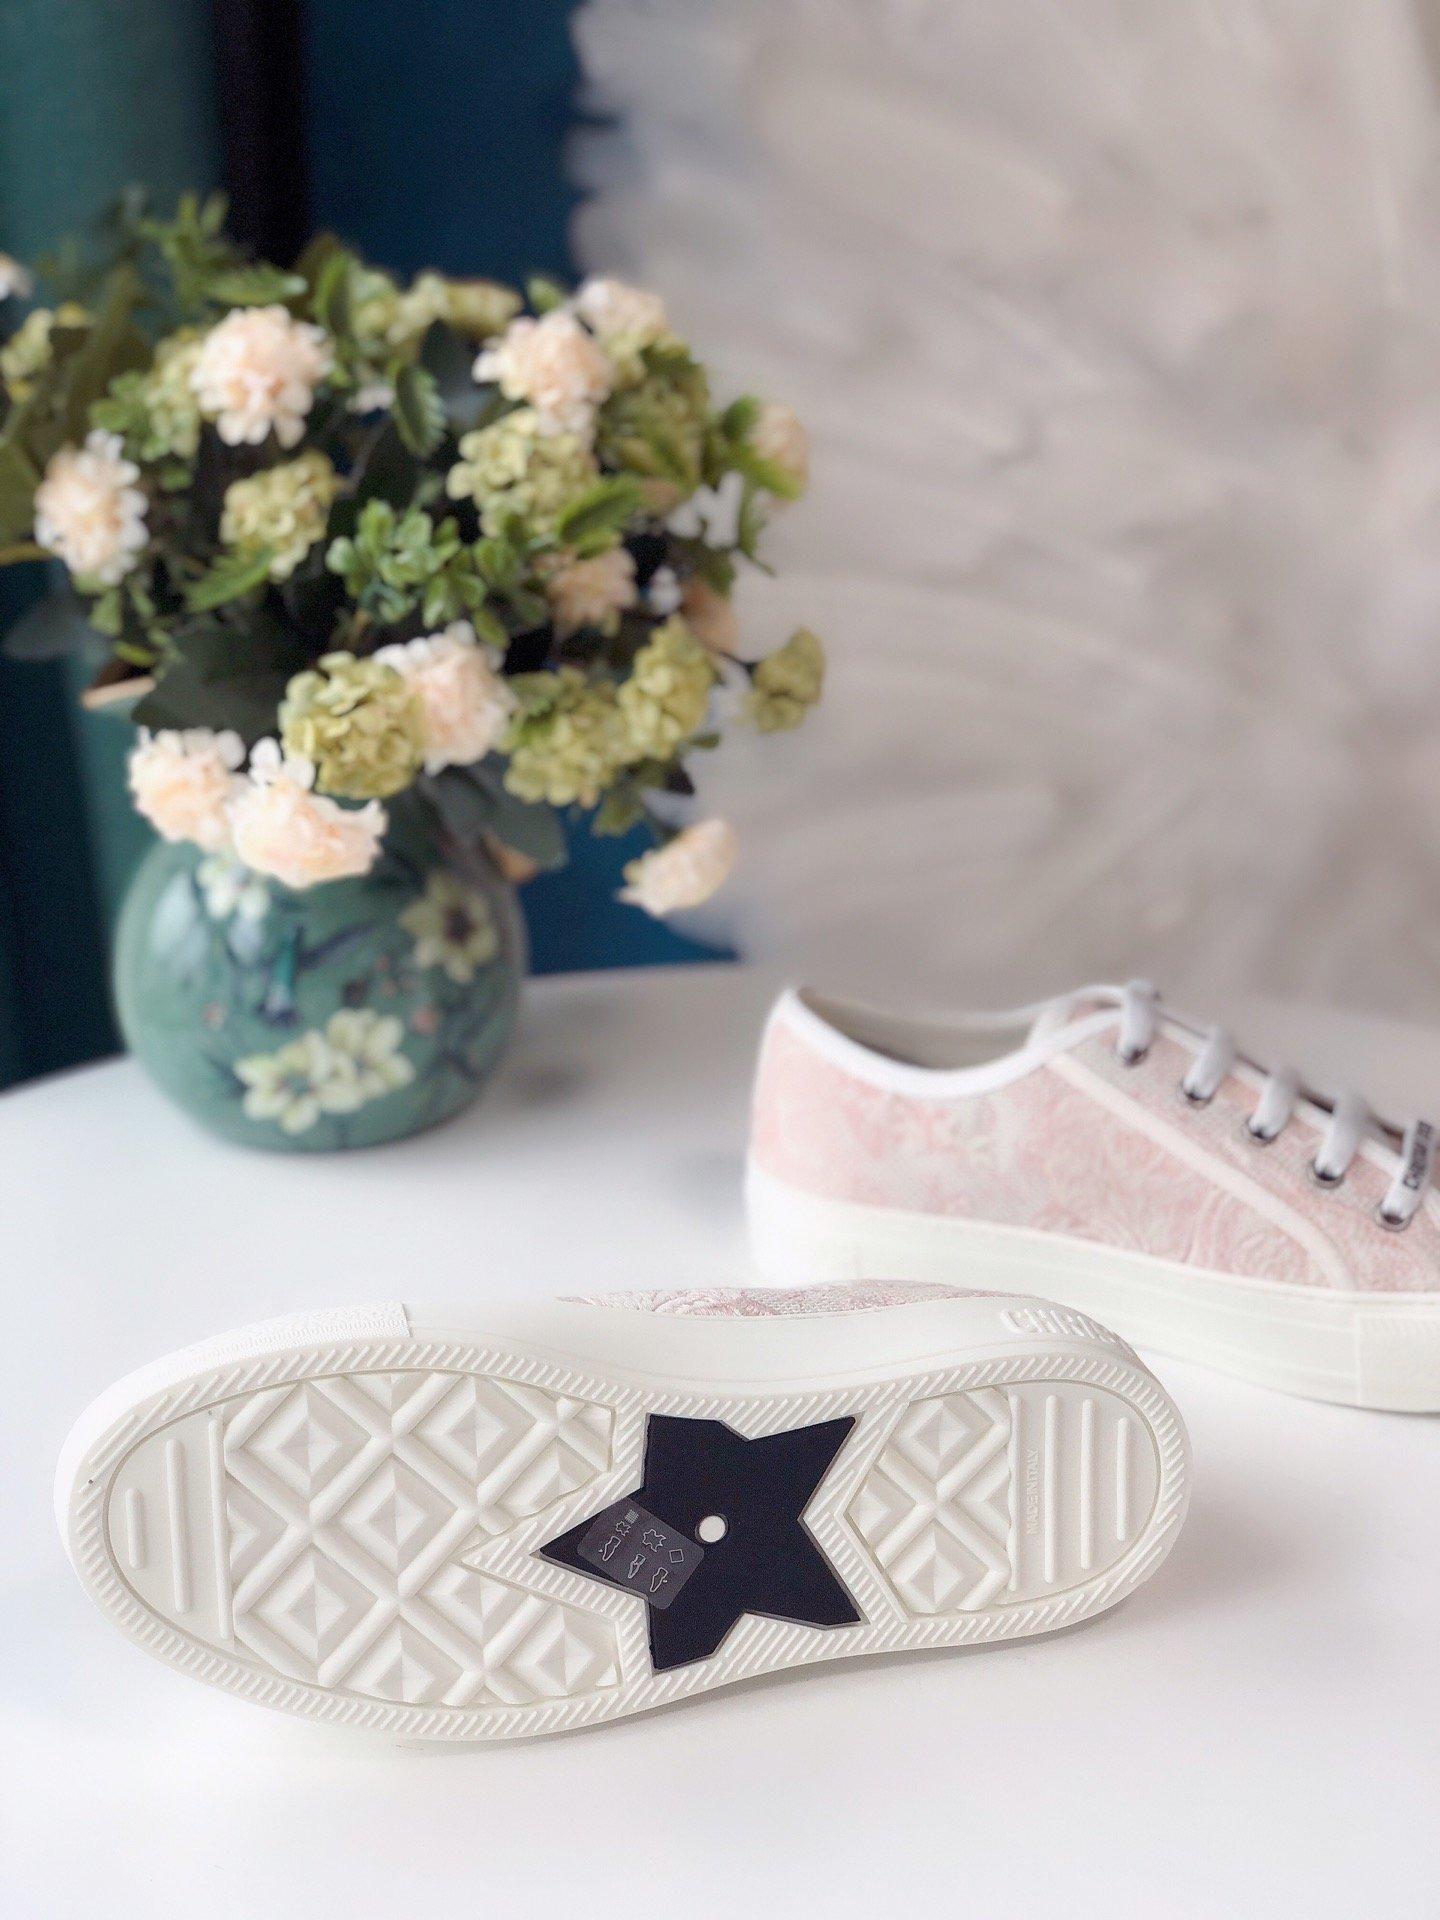 DIOR 2020 秀款板鞋 棉质TOILE DE JOUY 刺绣 WALKNDIOR 运动鞋(图7)